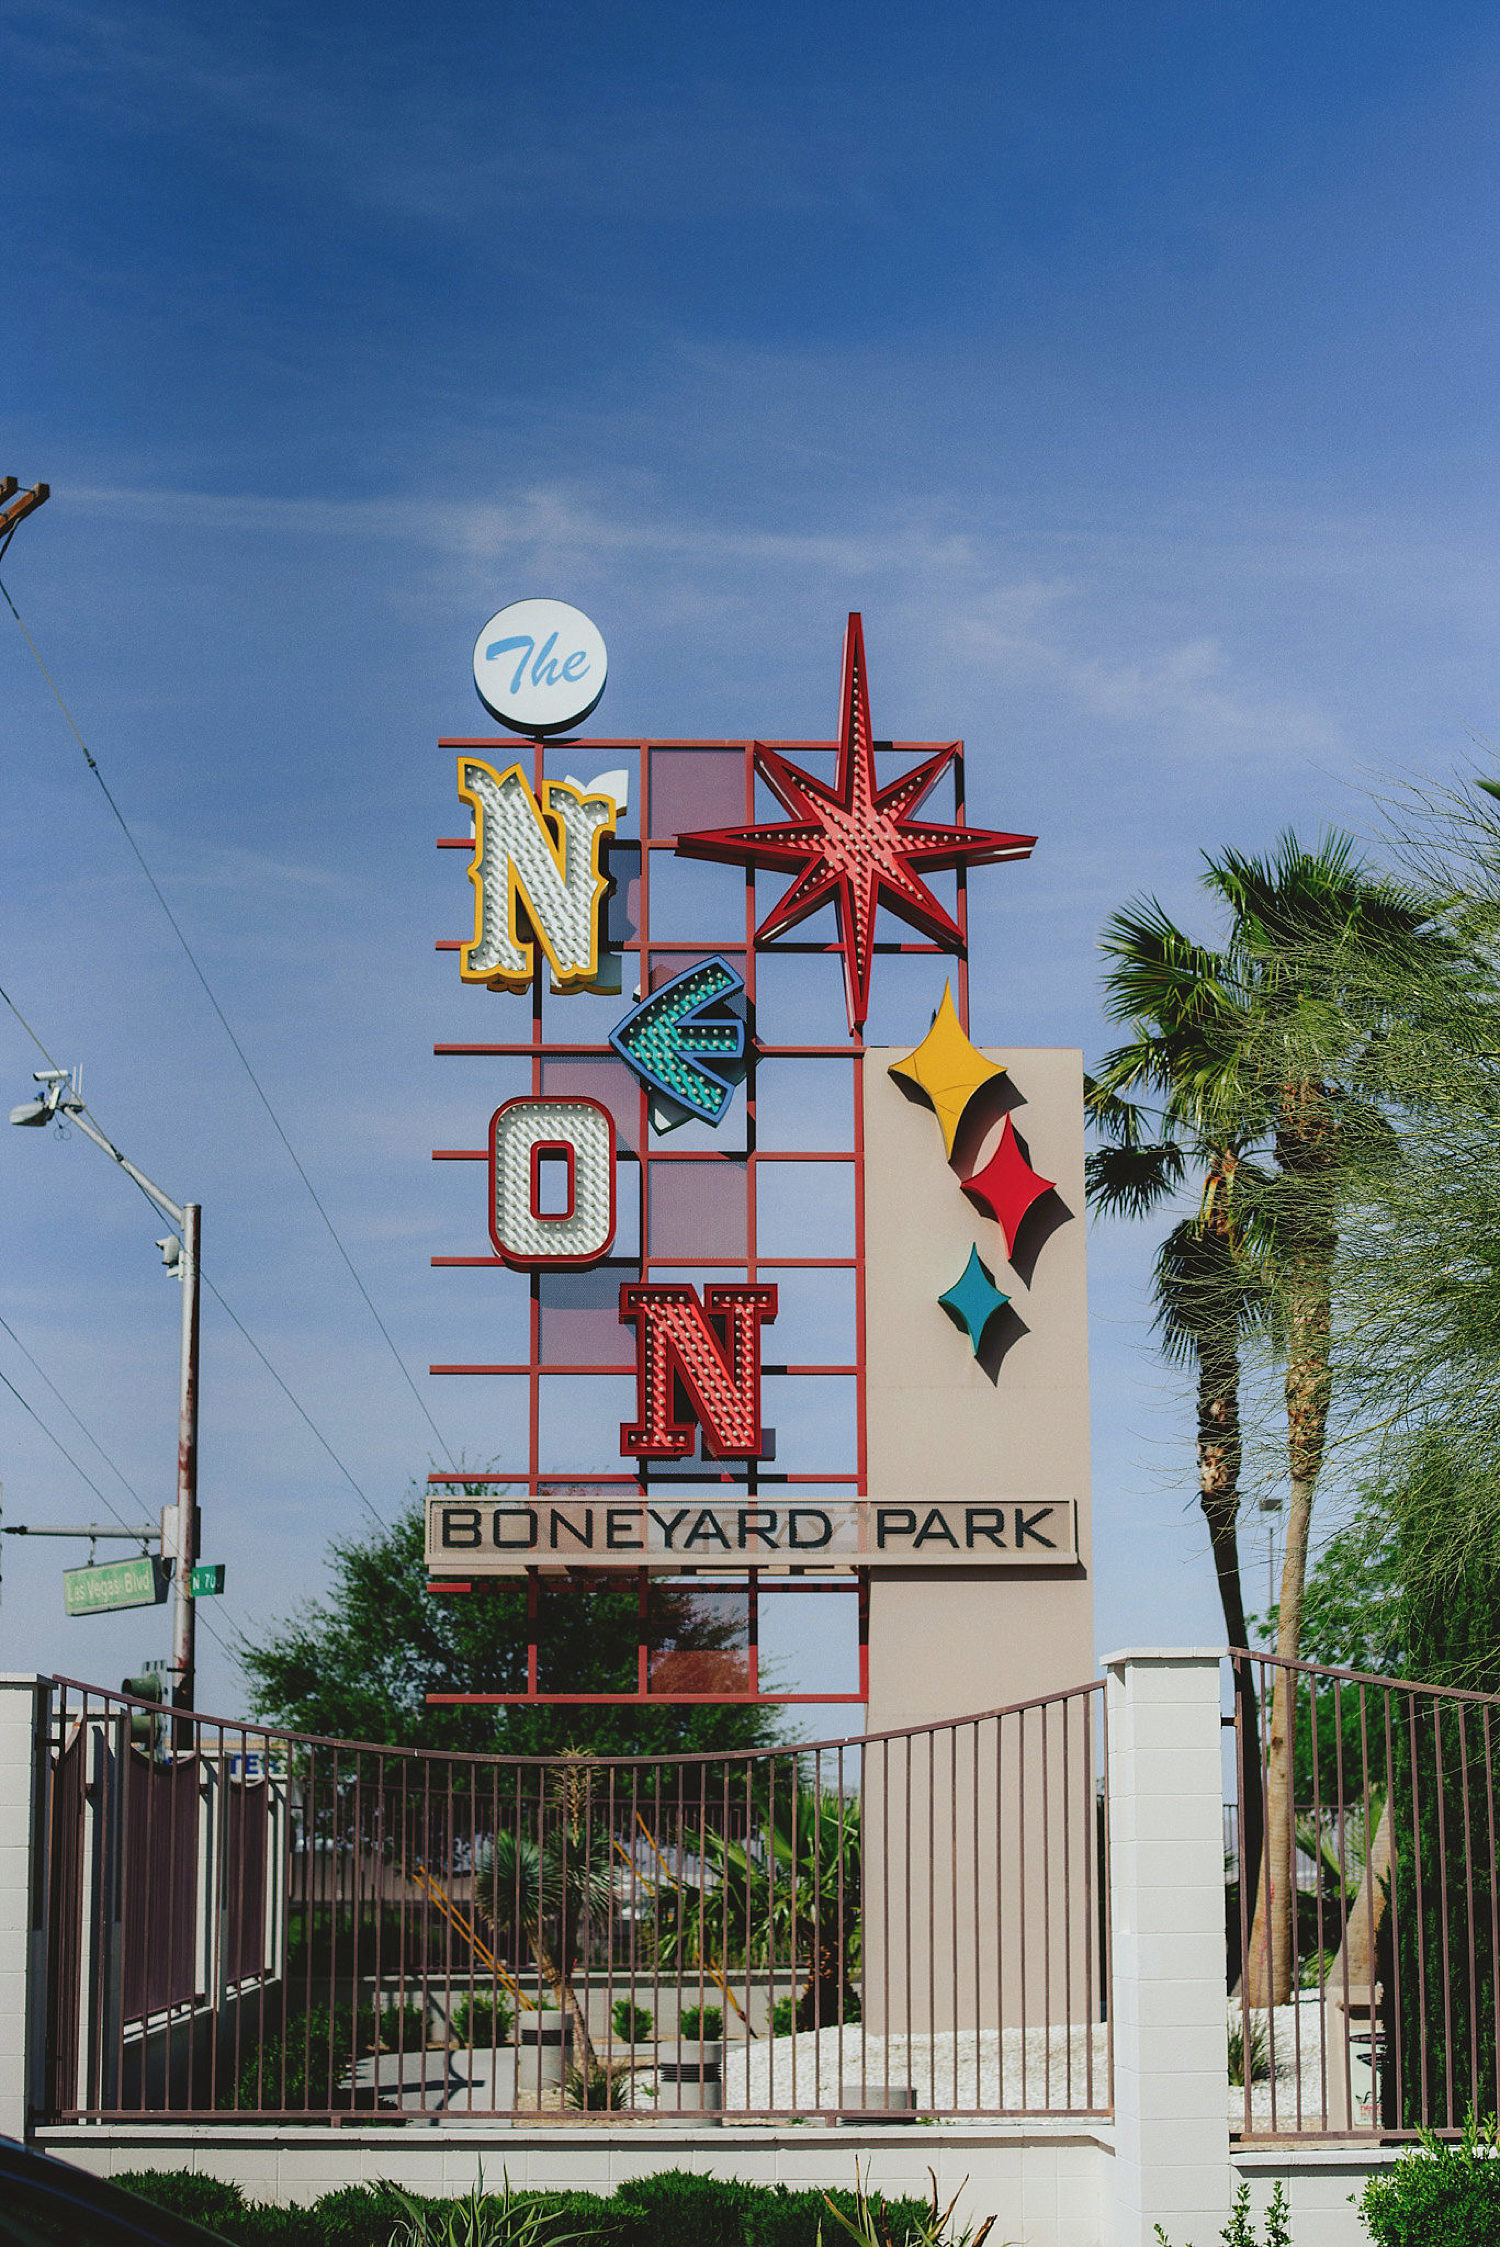 the neon boneyard park sign